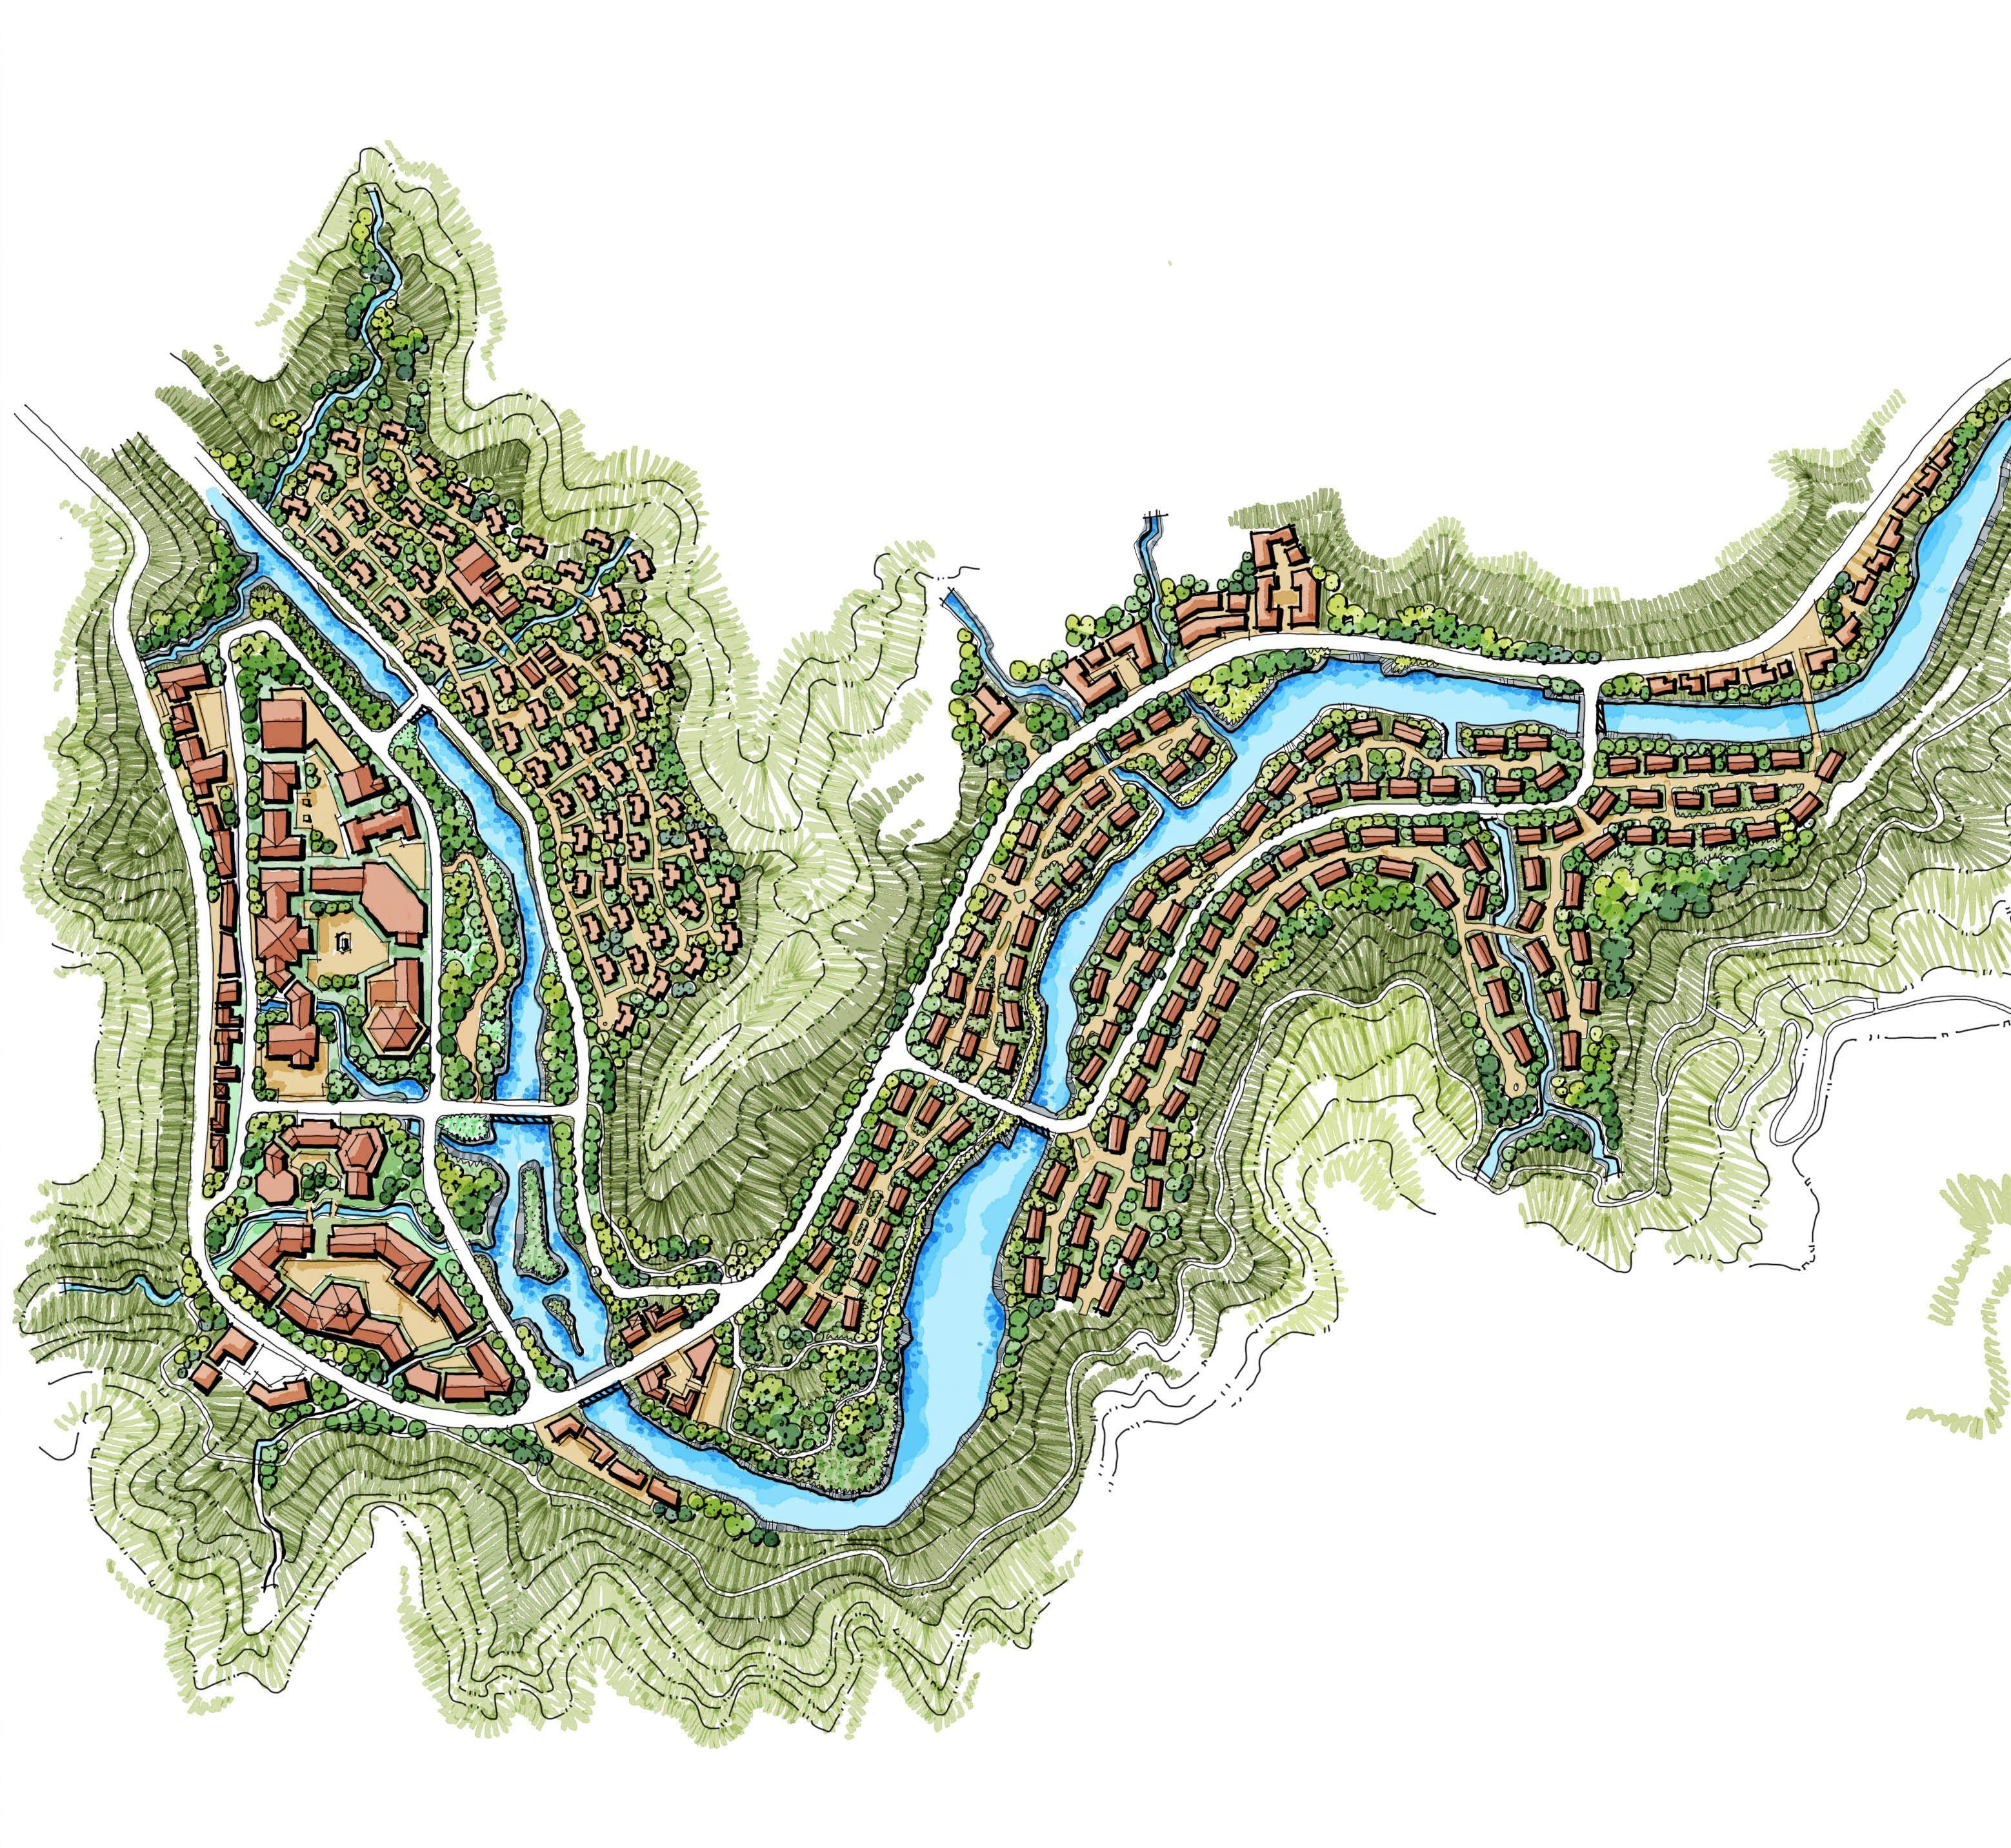 Master Plan Drawings: Mountain Villas, Mountain Landscape, Mix Use, China Houses